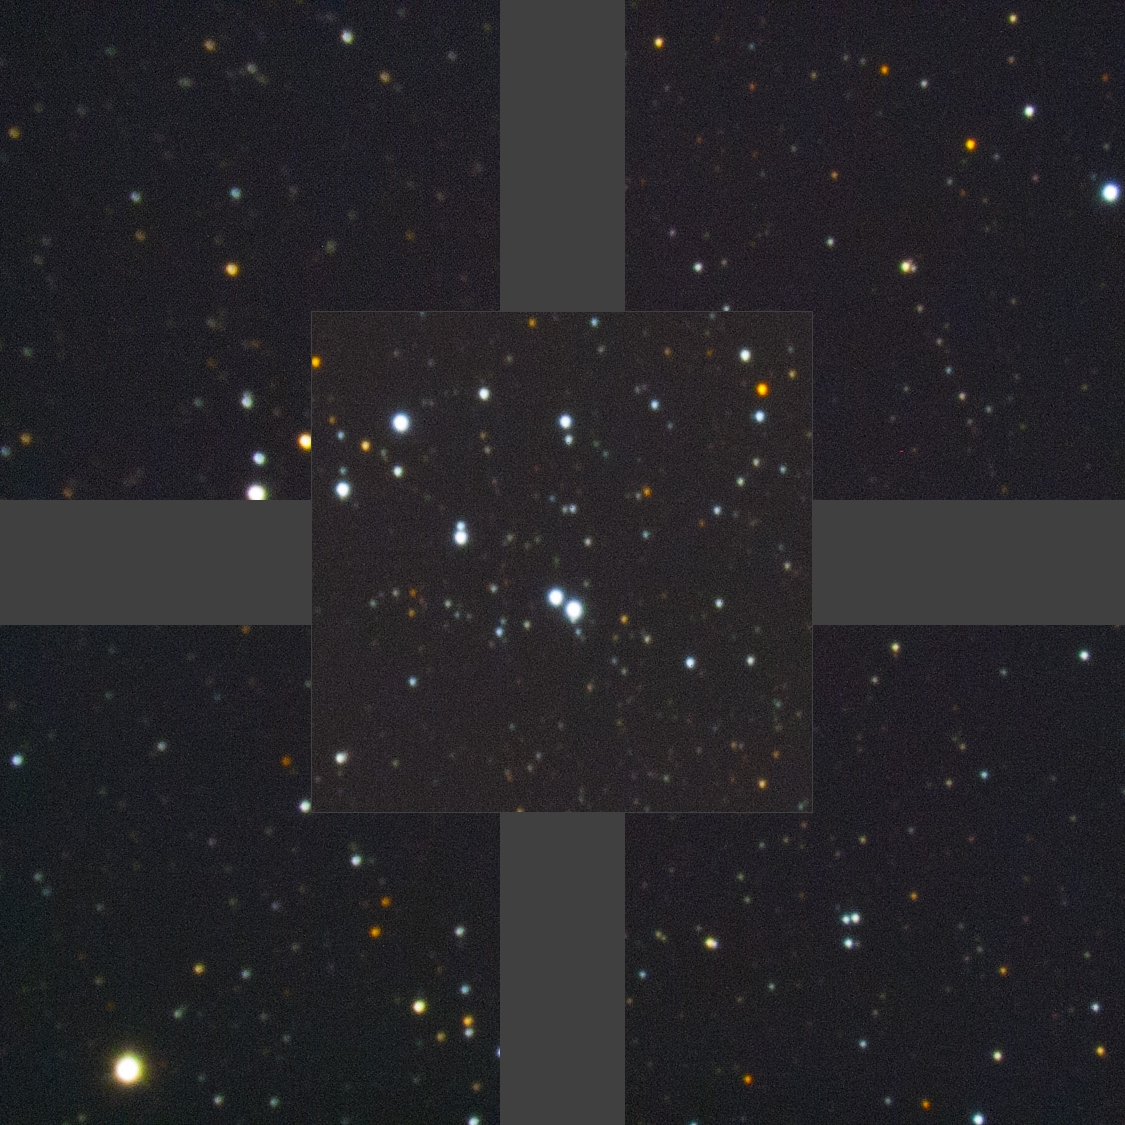 NGC6883_F8_5_EOS1000D_120s_800ASA_colorA_corners.JPG